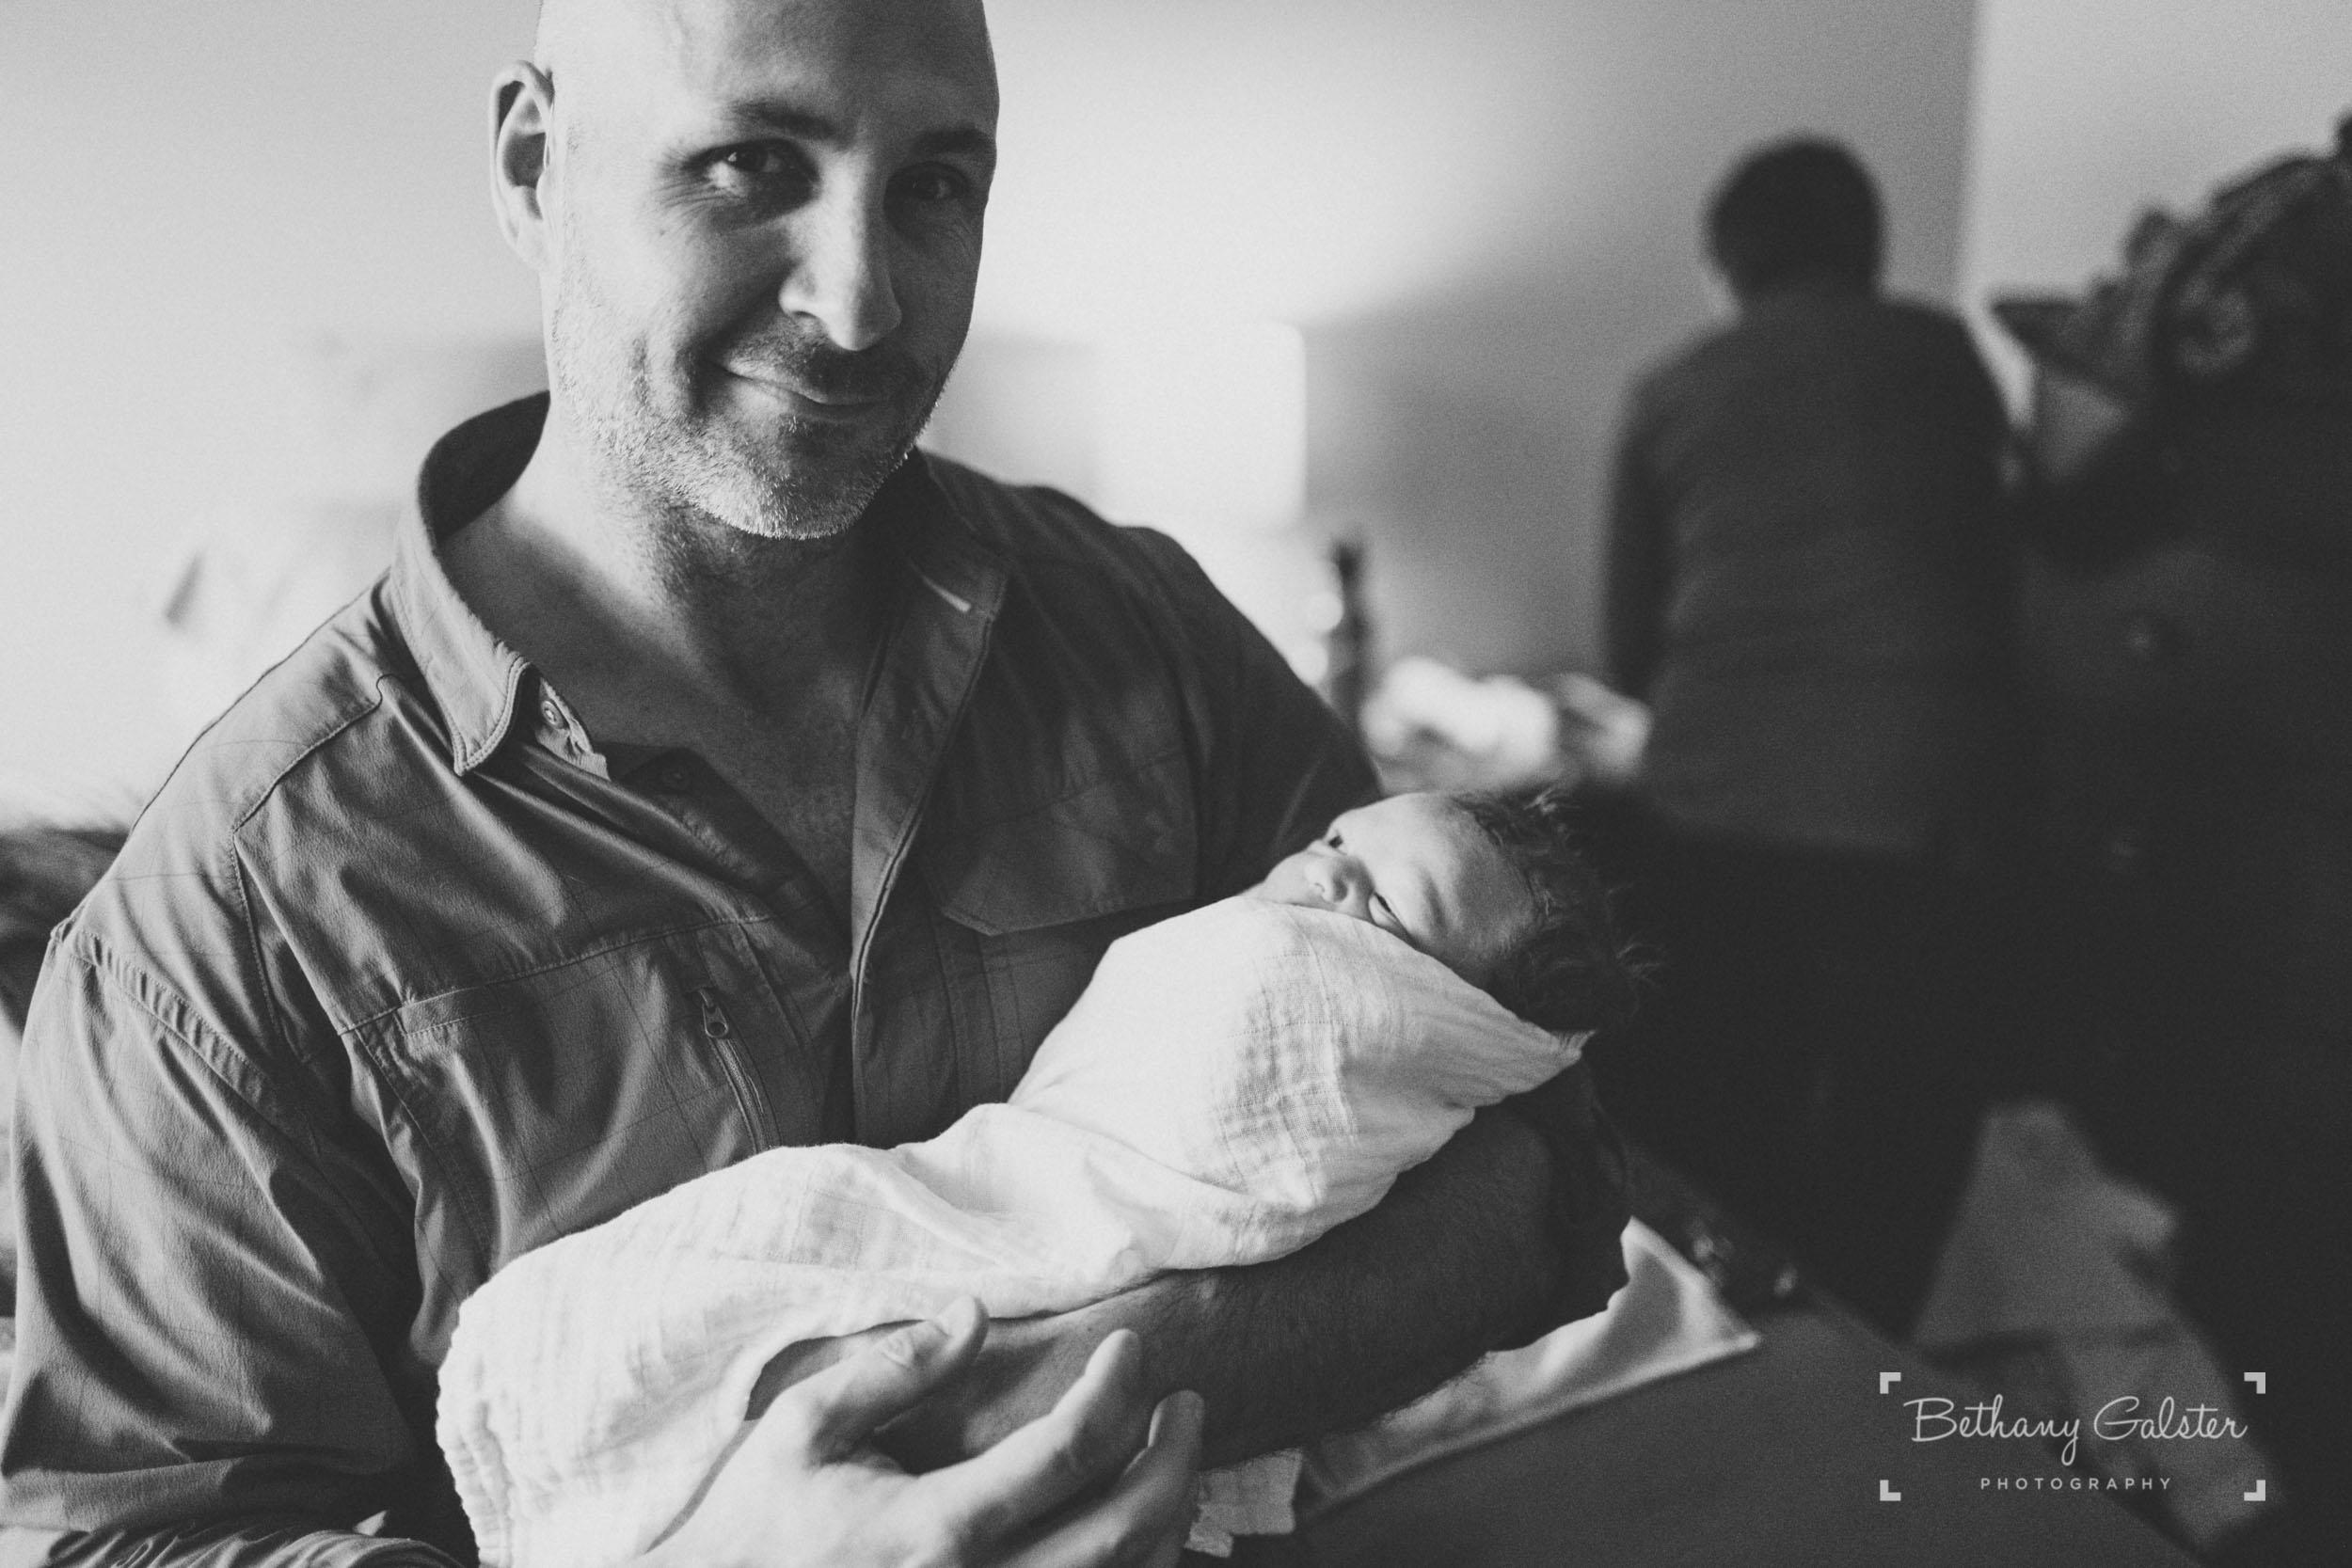 Bethany Galster Calgary Birth Photographer (25 of 25).jpg